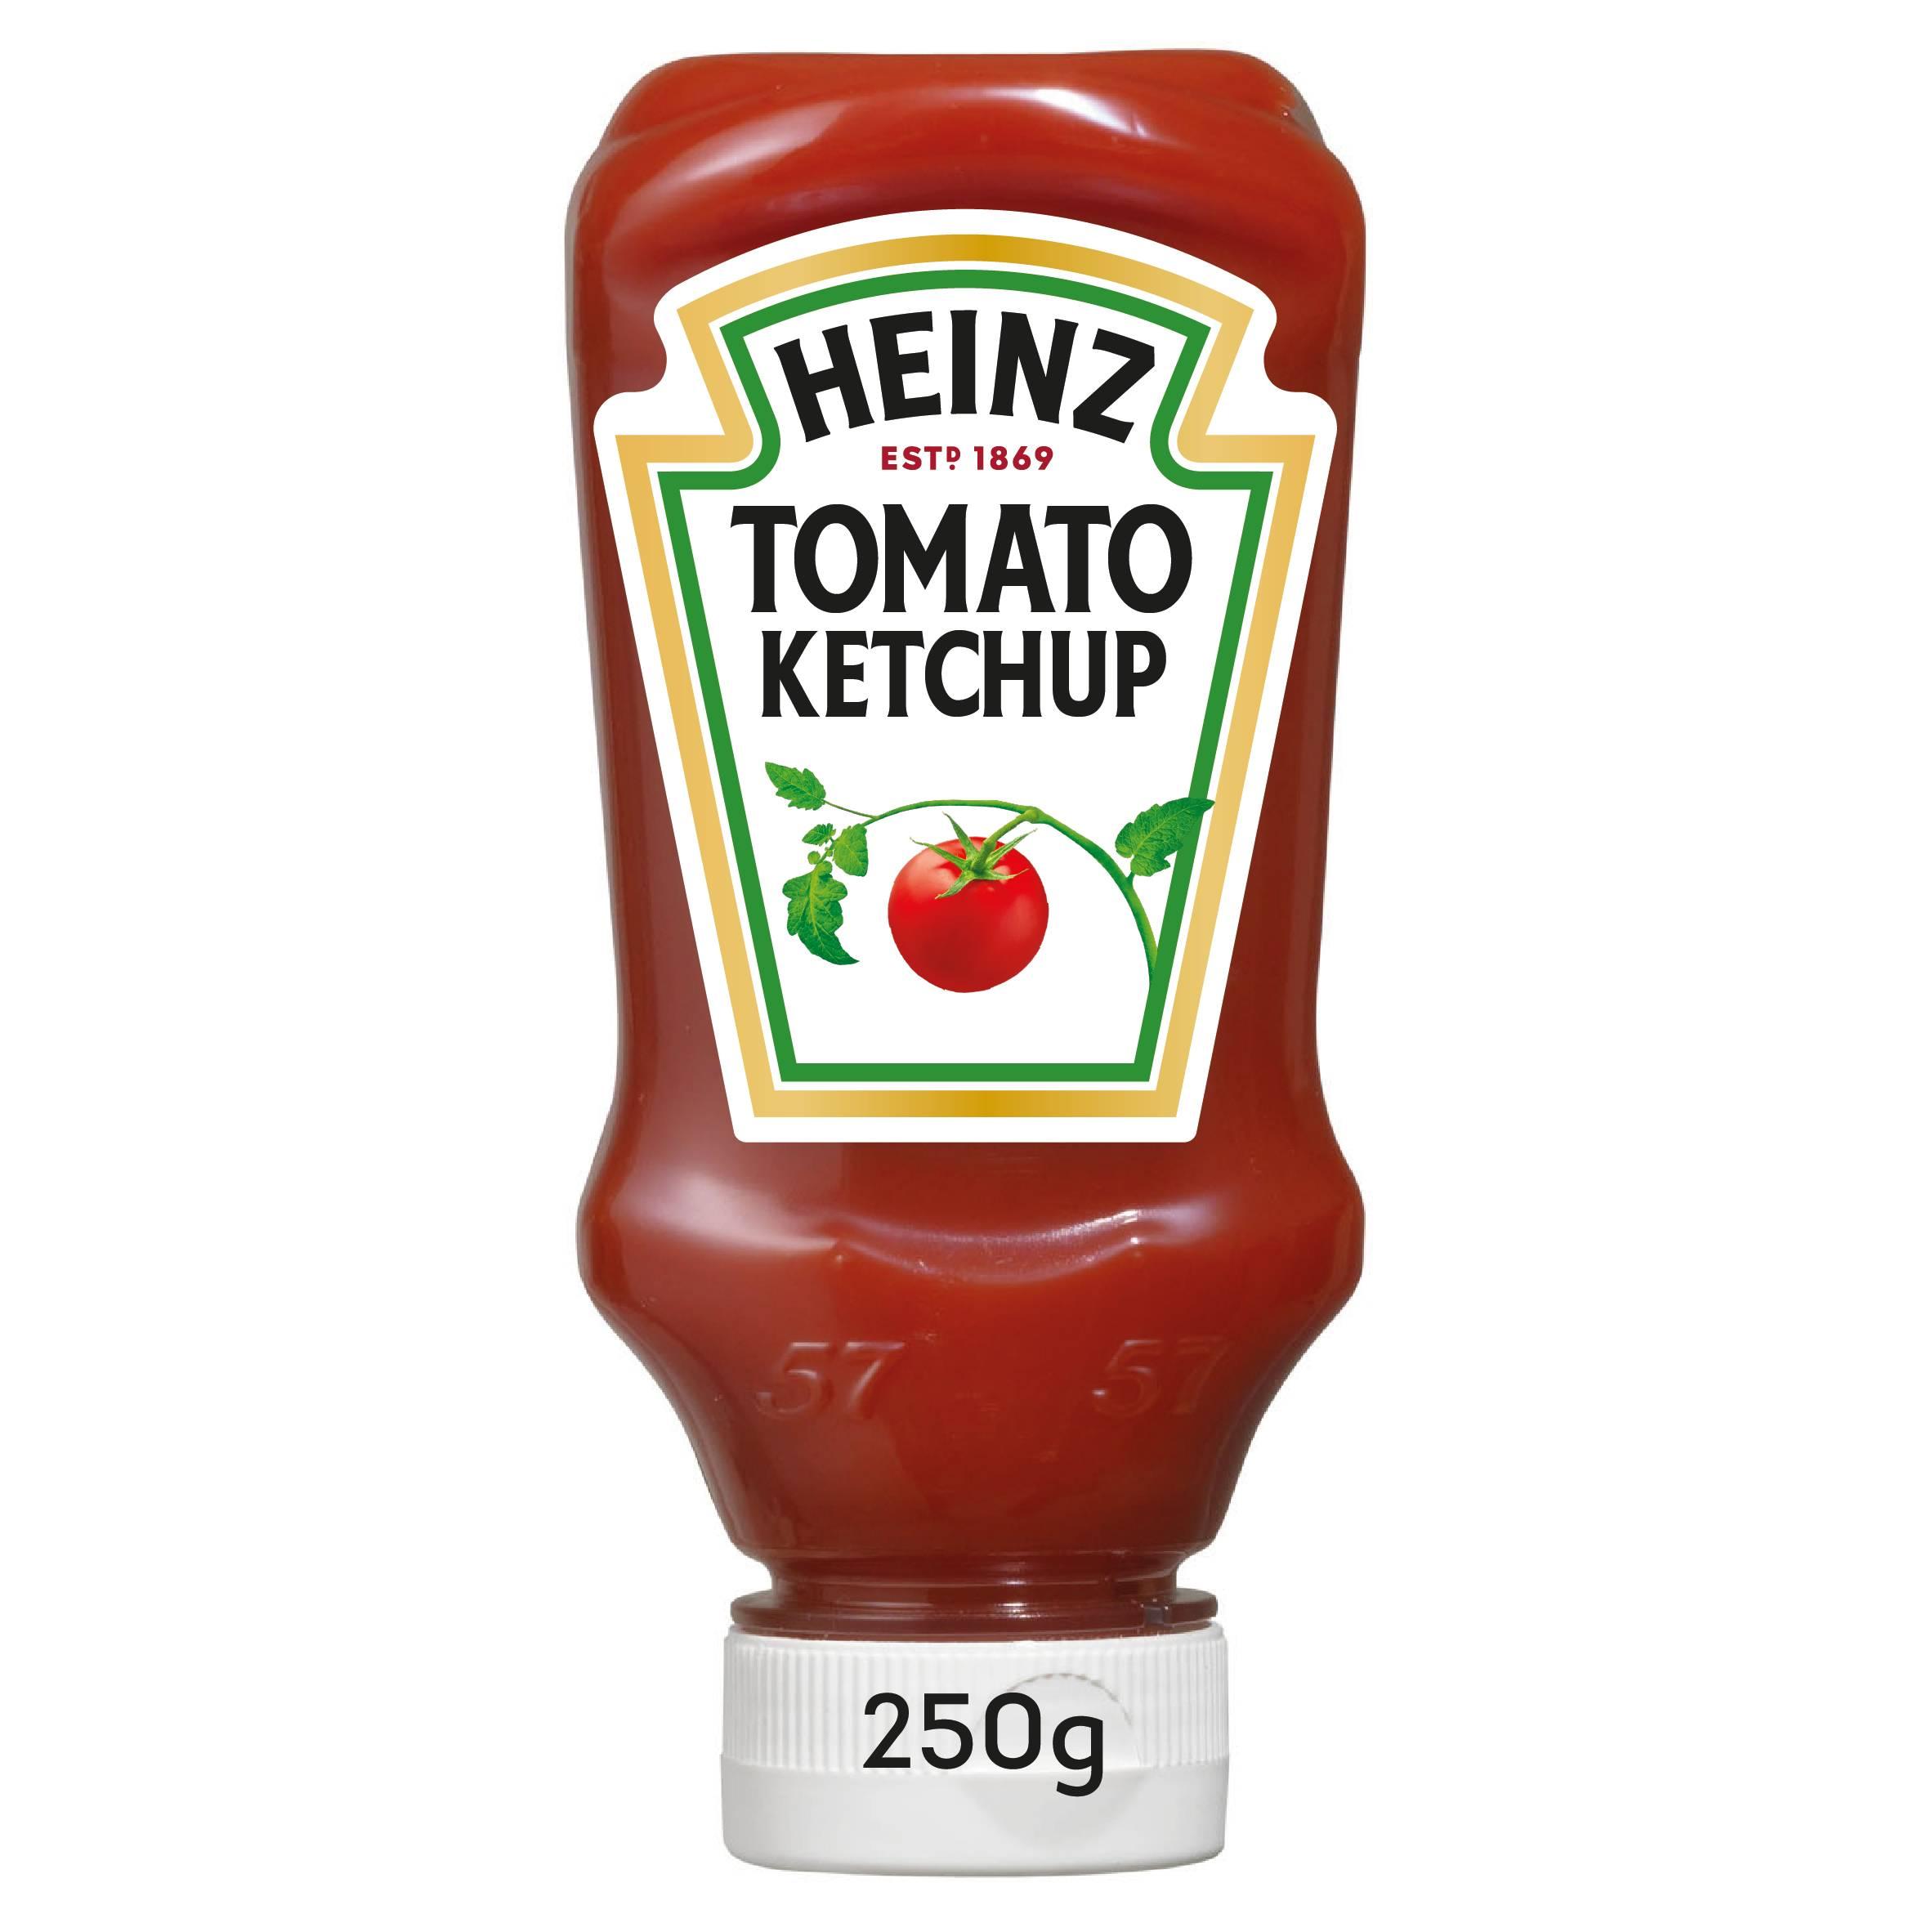 Heinz Tomato Ketchup 250g Top Down image